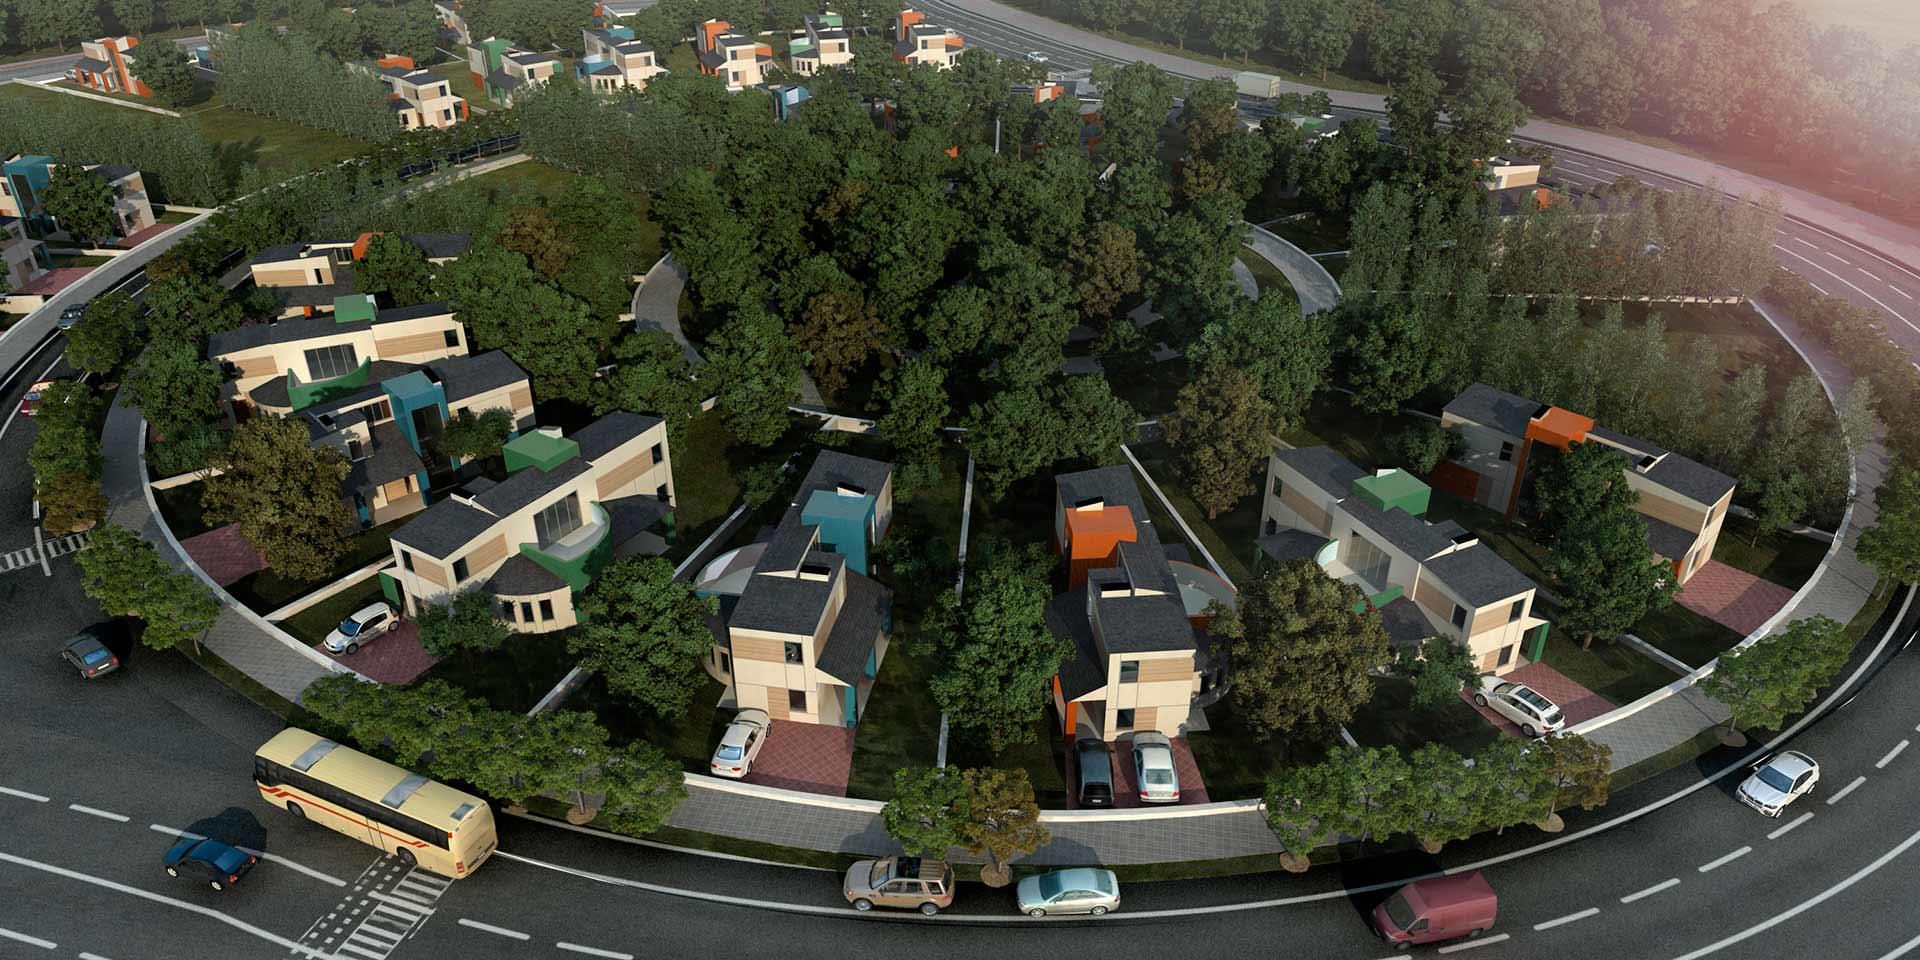 luxury-housing-development-in-costa-brava (7)